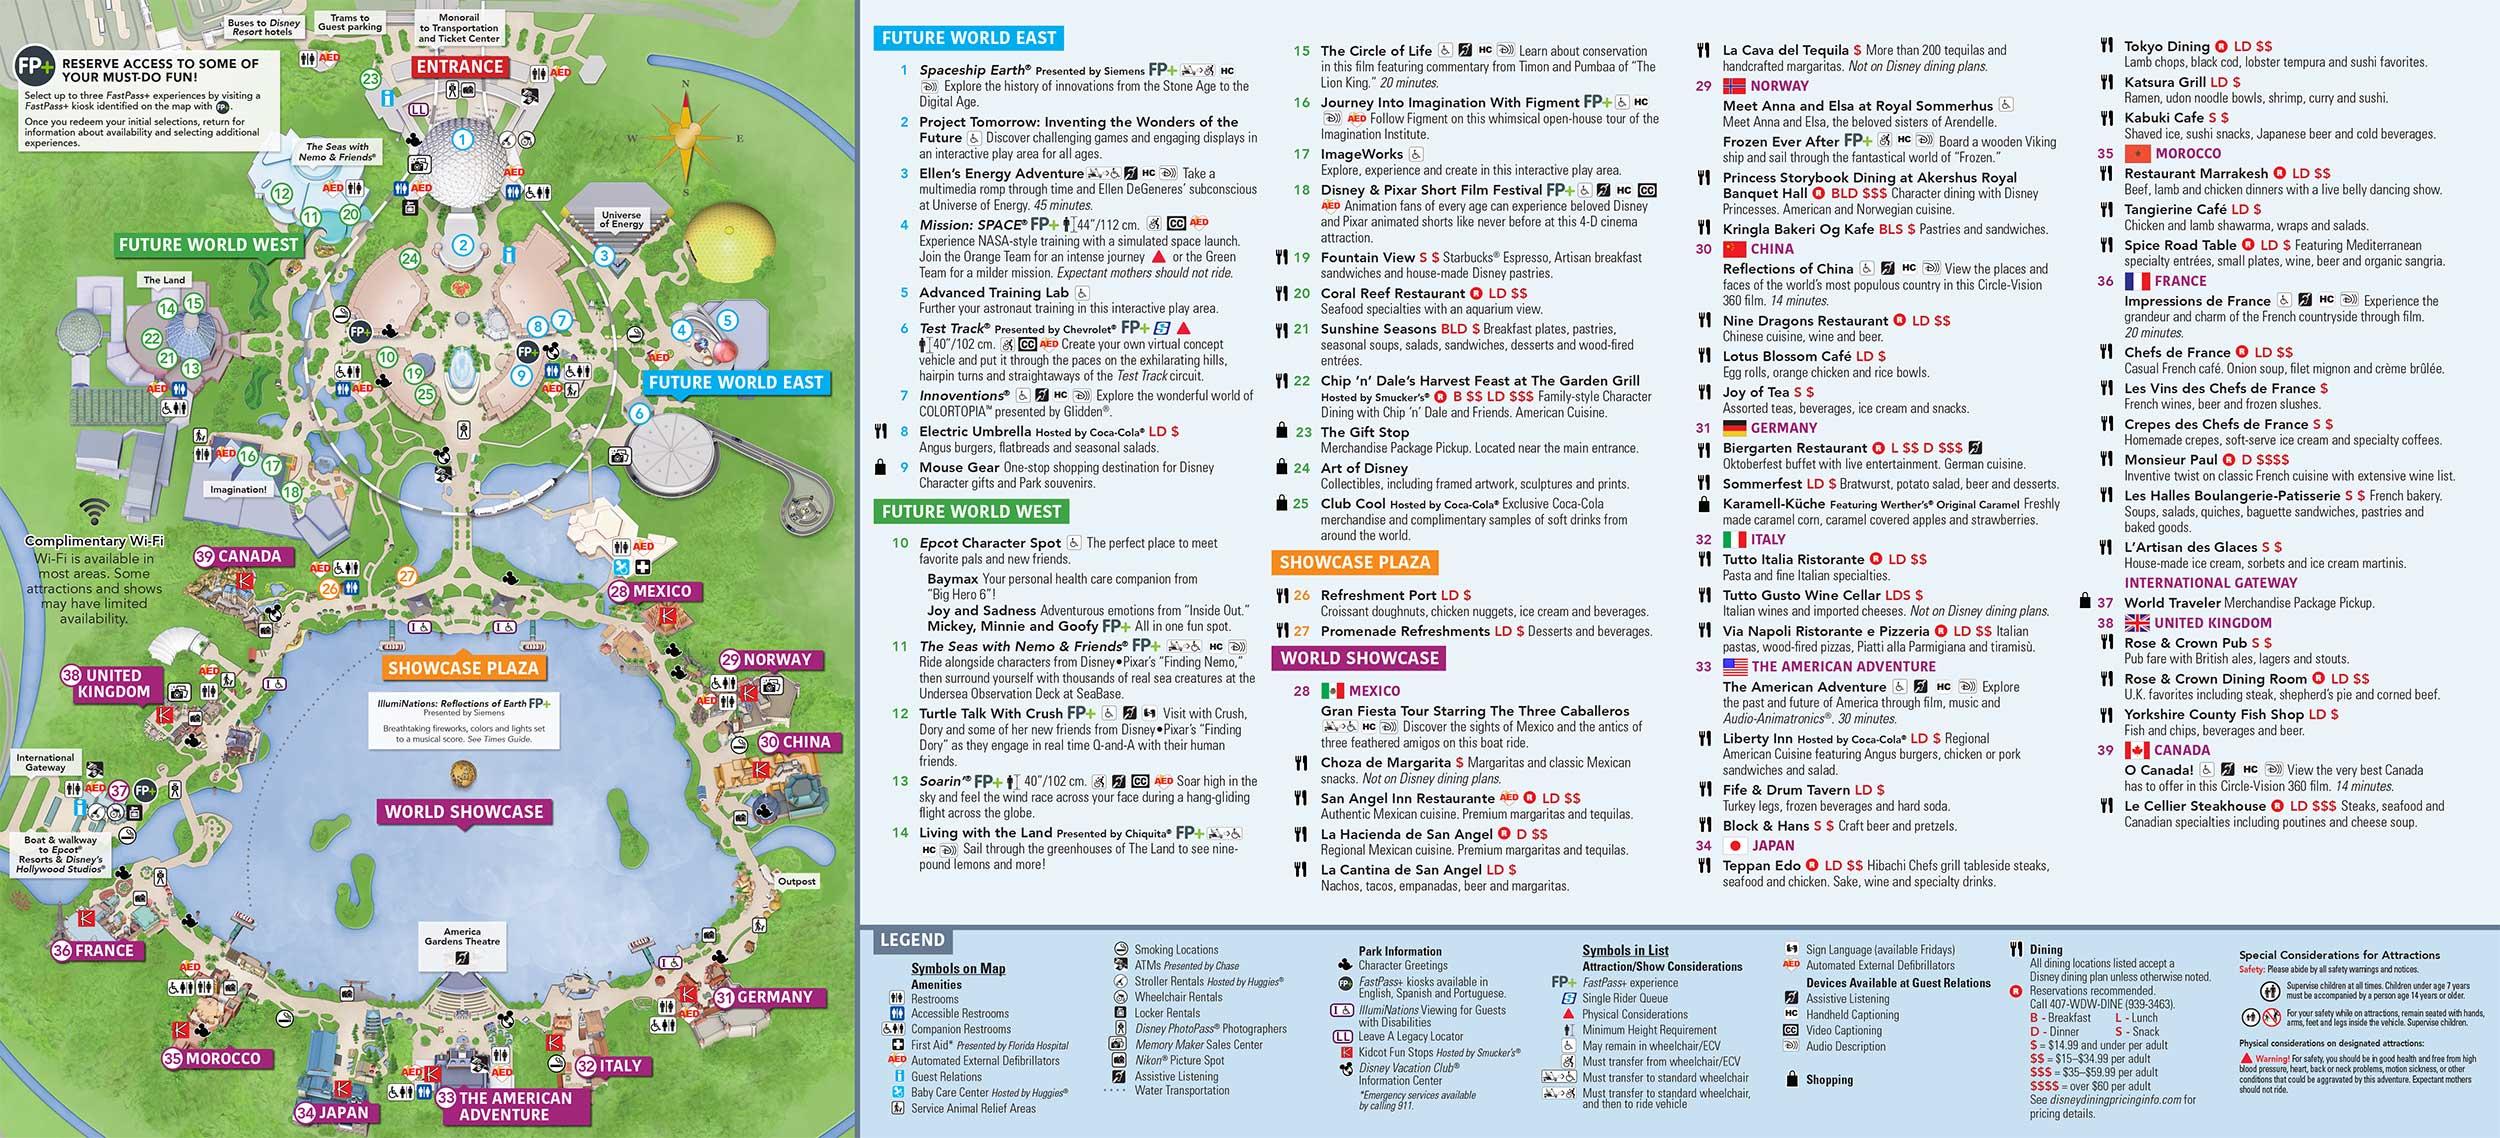 Walt Disney World 1-Day Base Ticket + Fast Pass - Orlando Attractions